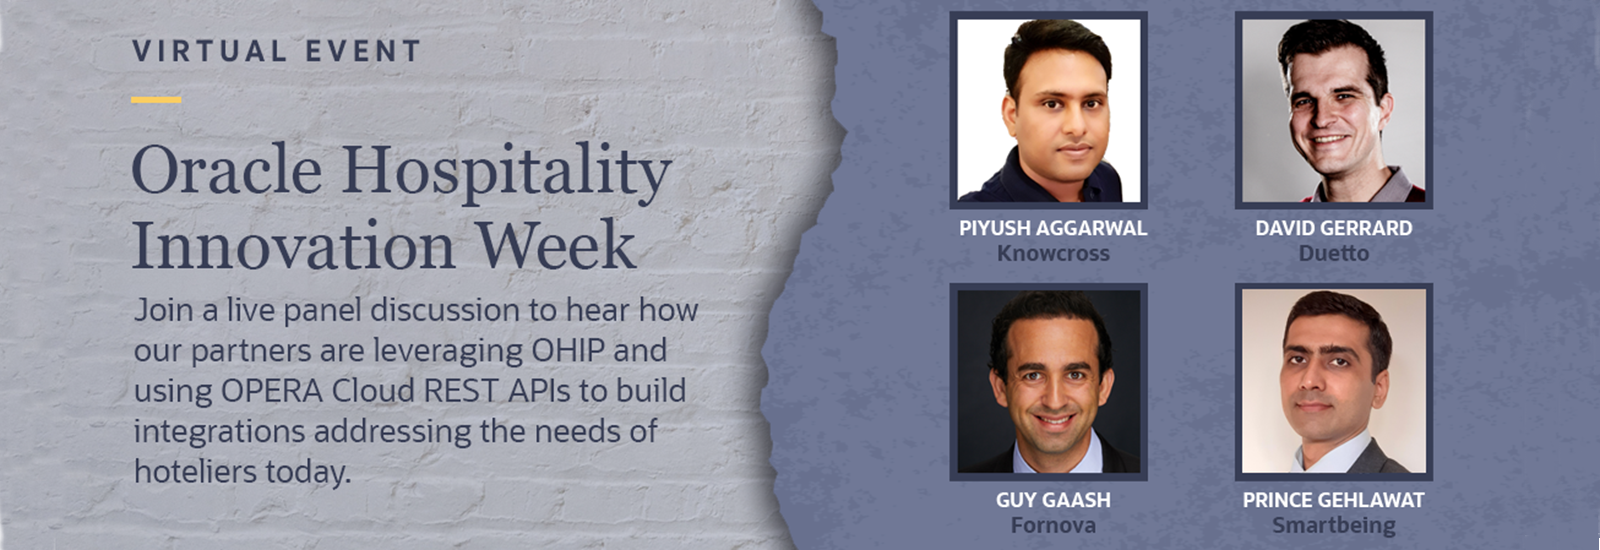 Oracle Hospitality Innovation Week 2021